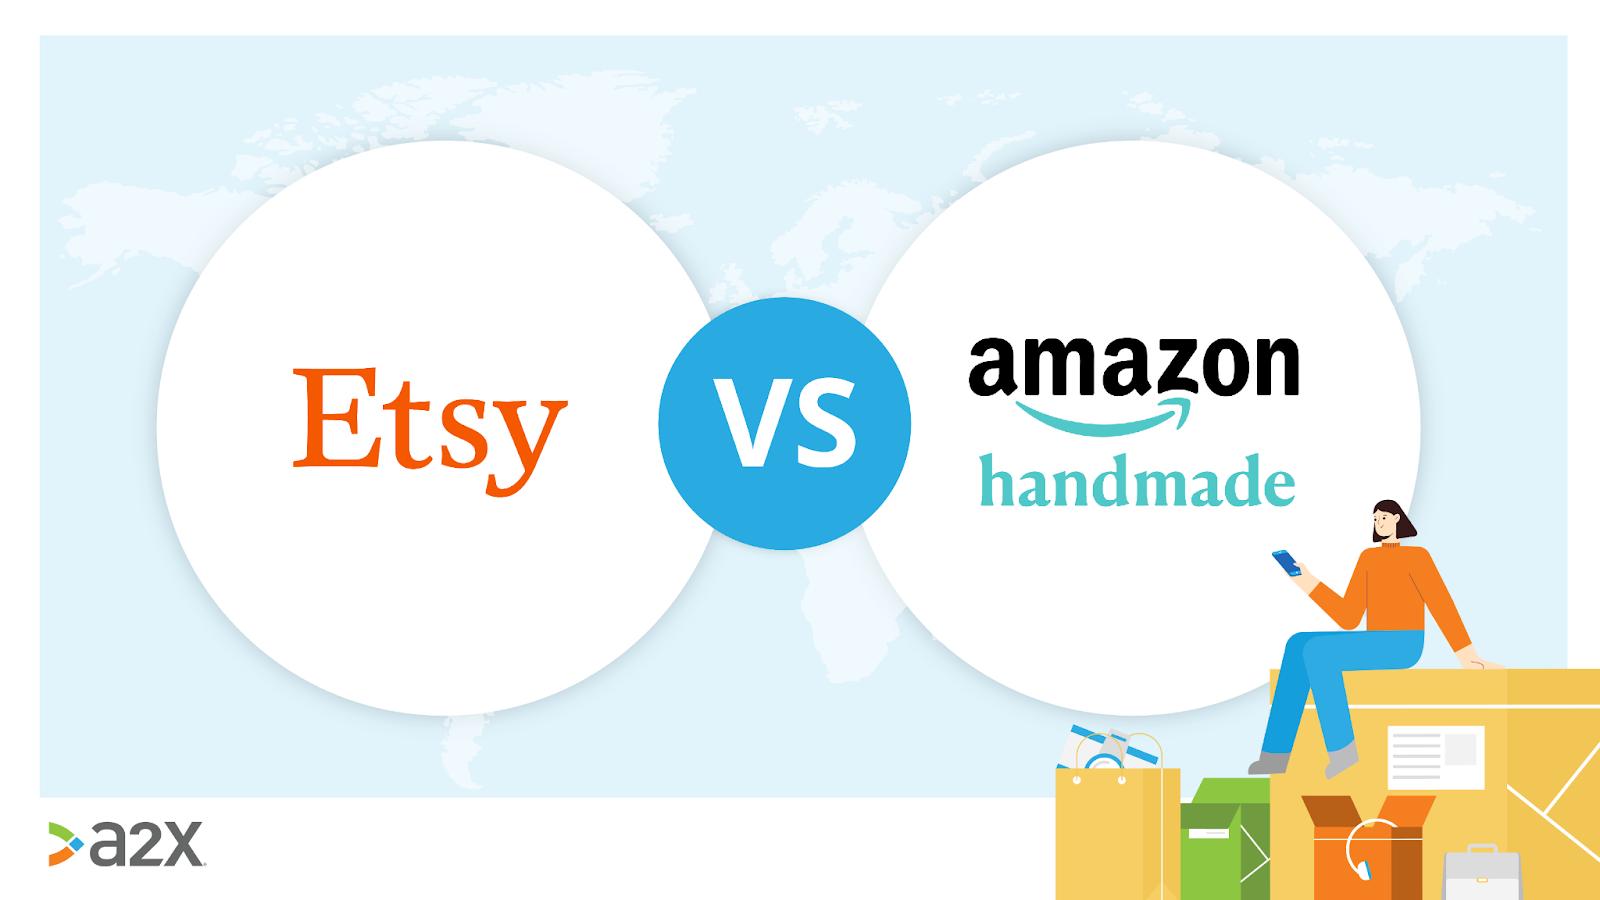 Etsy vs Amazon